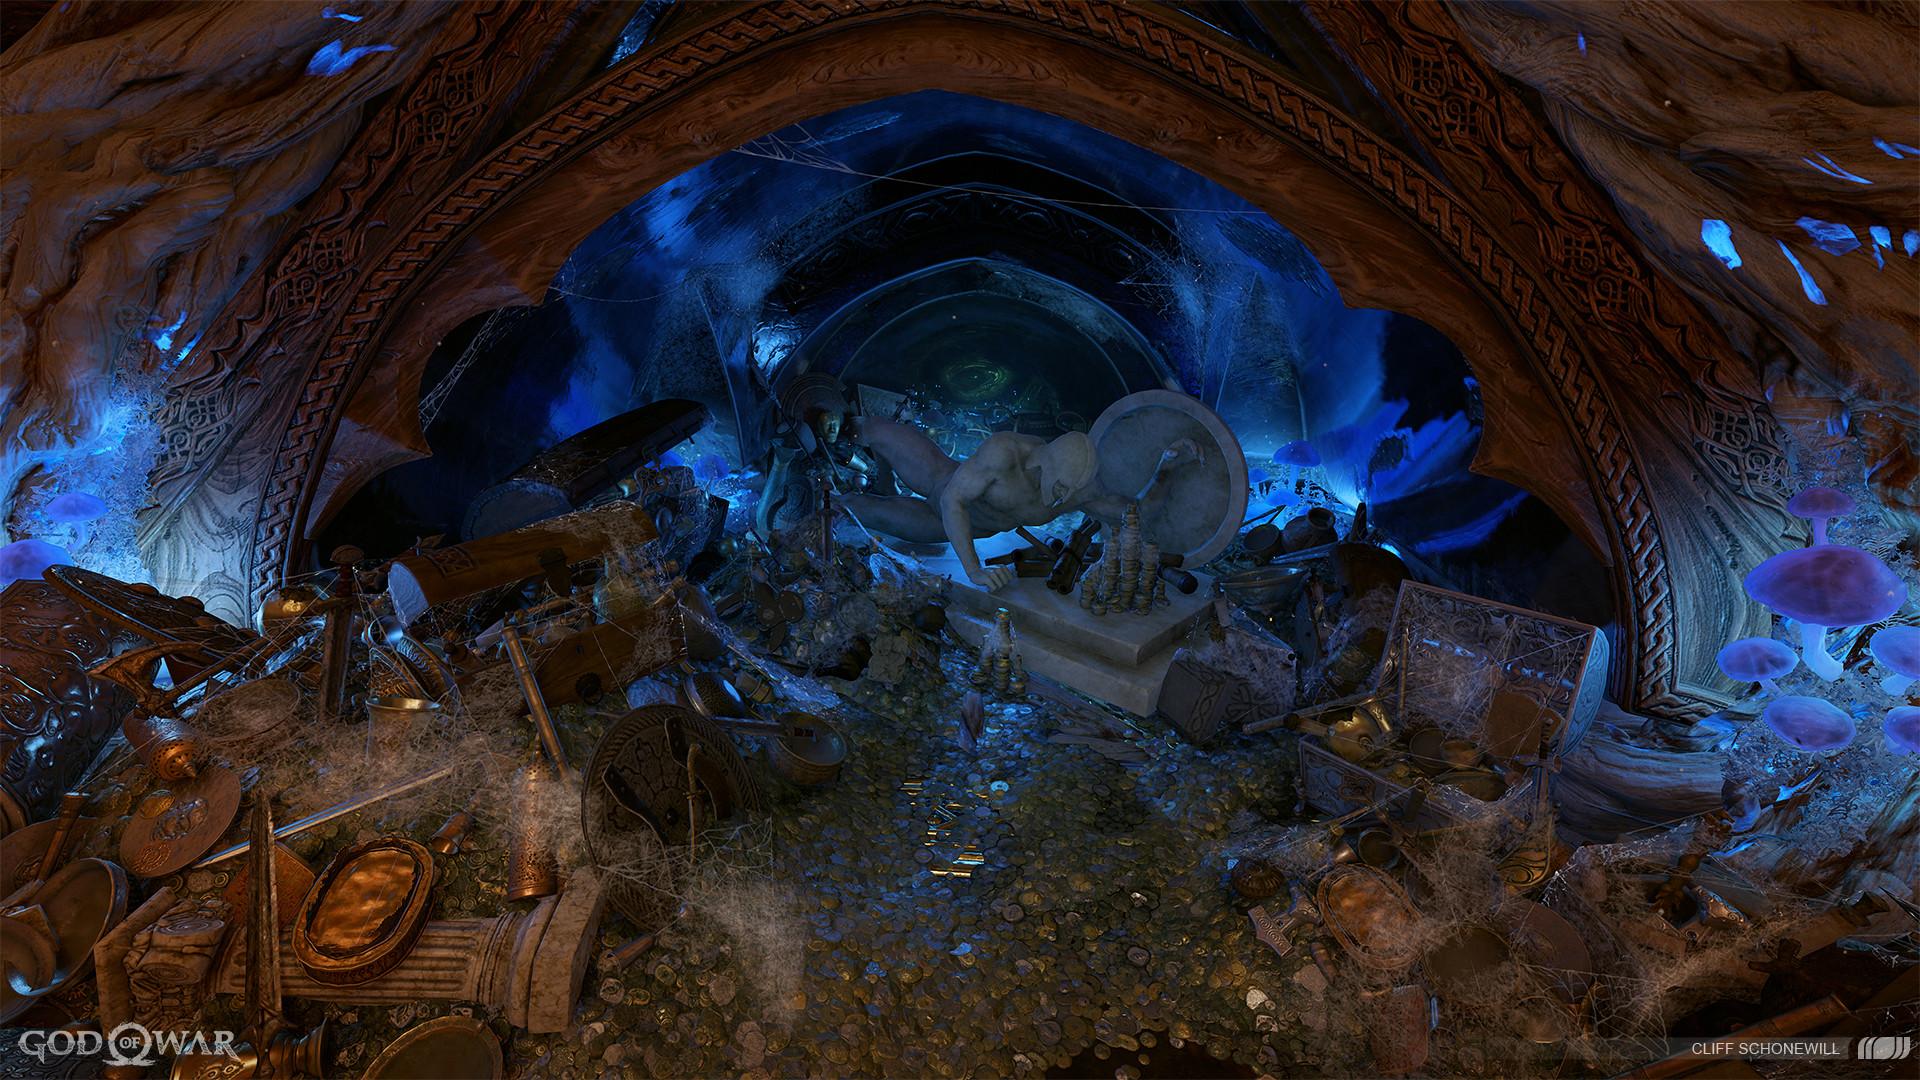 Cliff schonewill tyrsvault vaultrooms 23